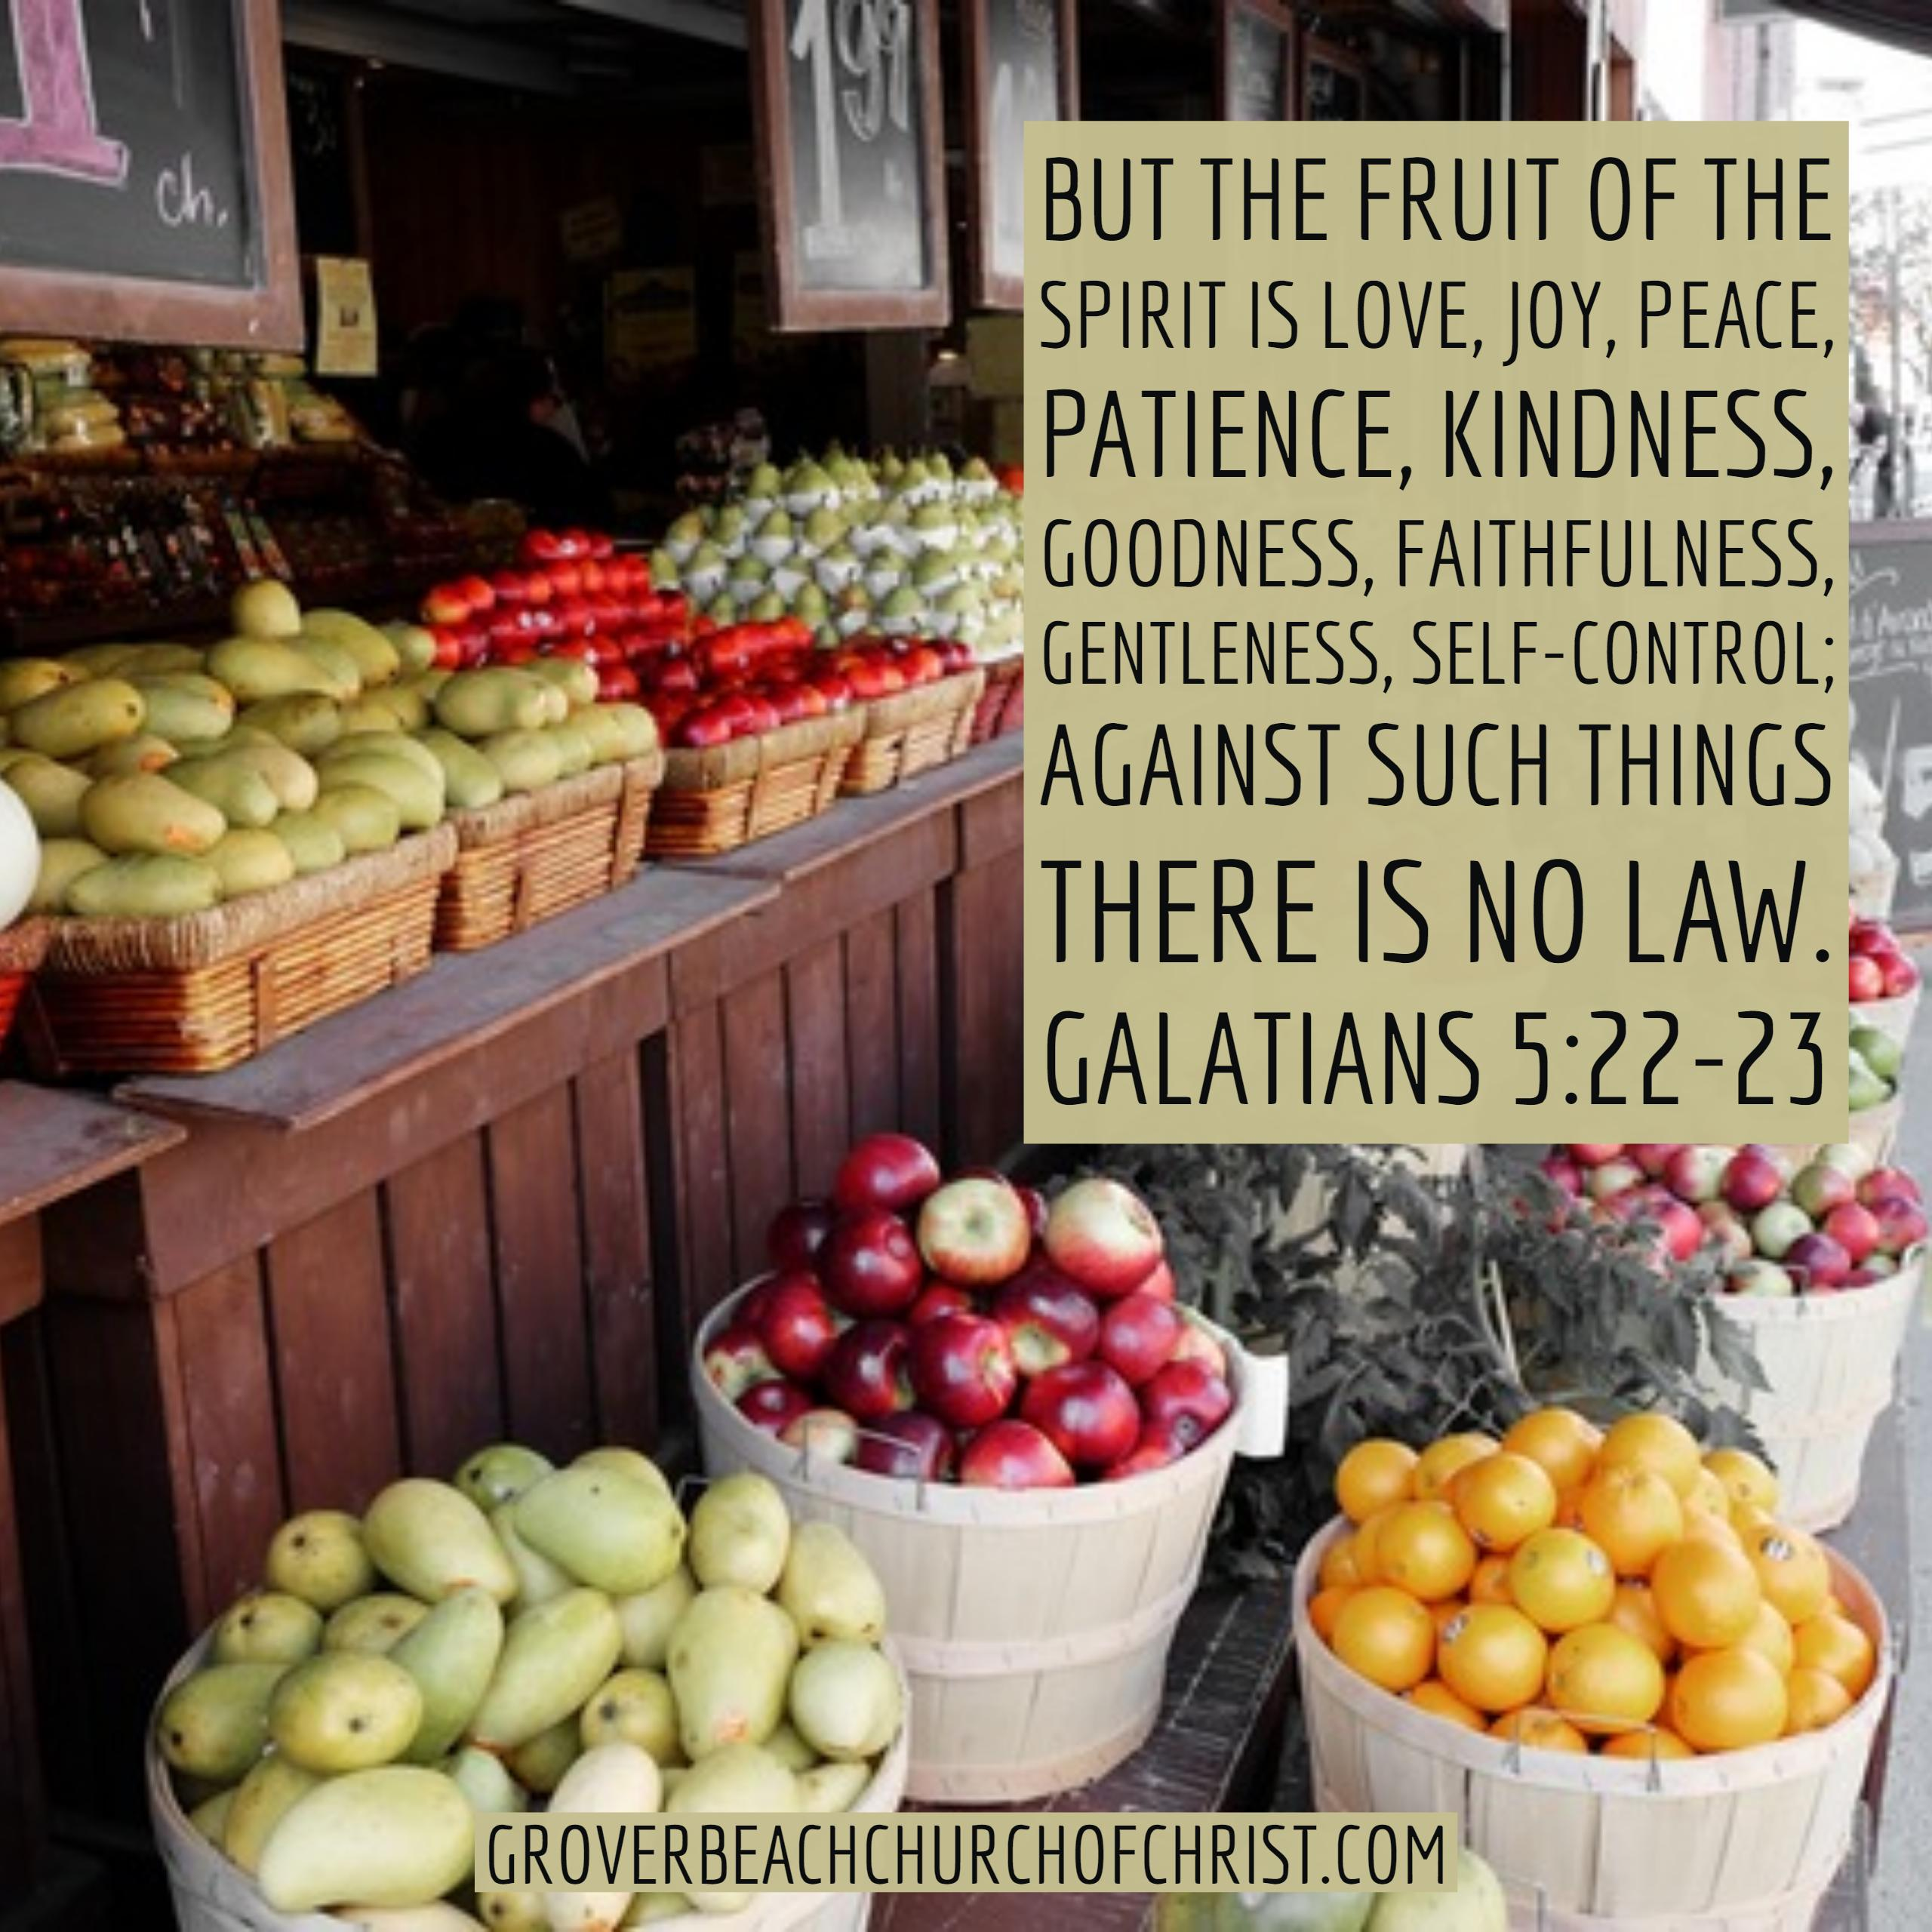 galatians-5-22-23-fruit-of-the-spirit